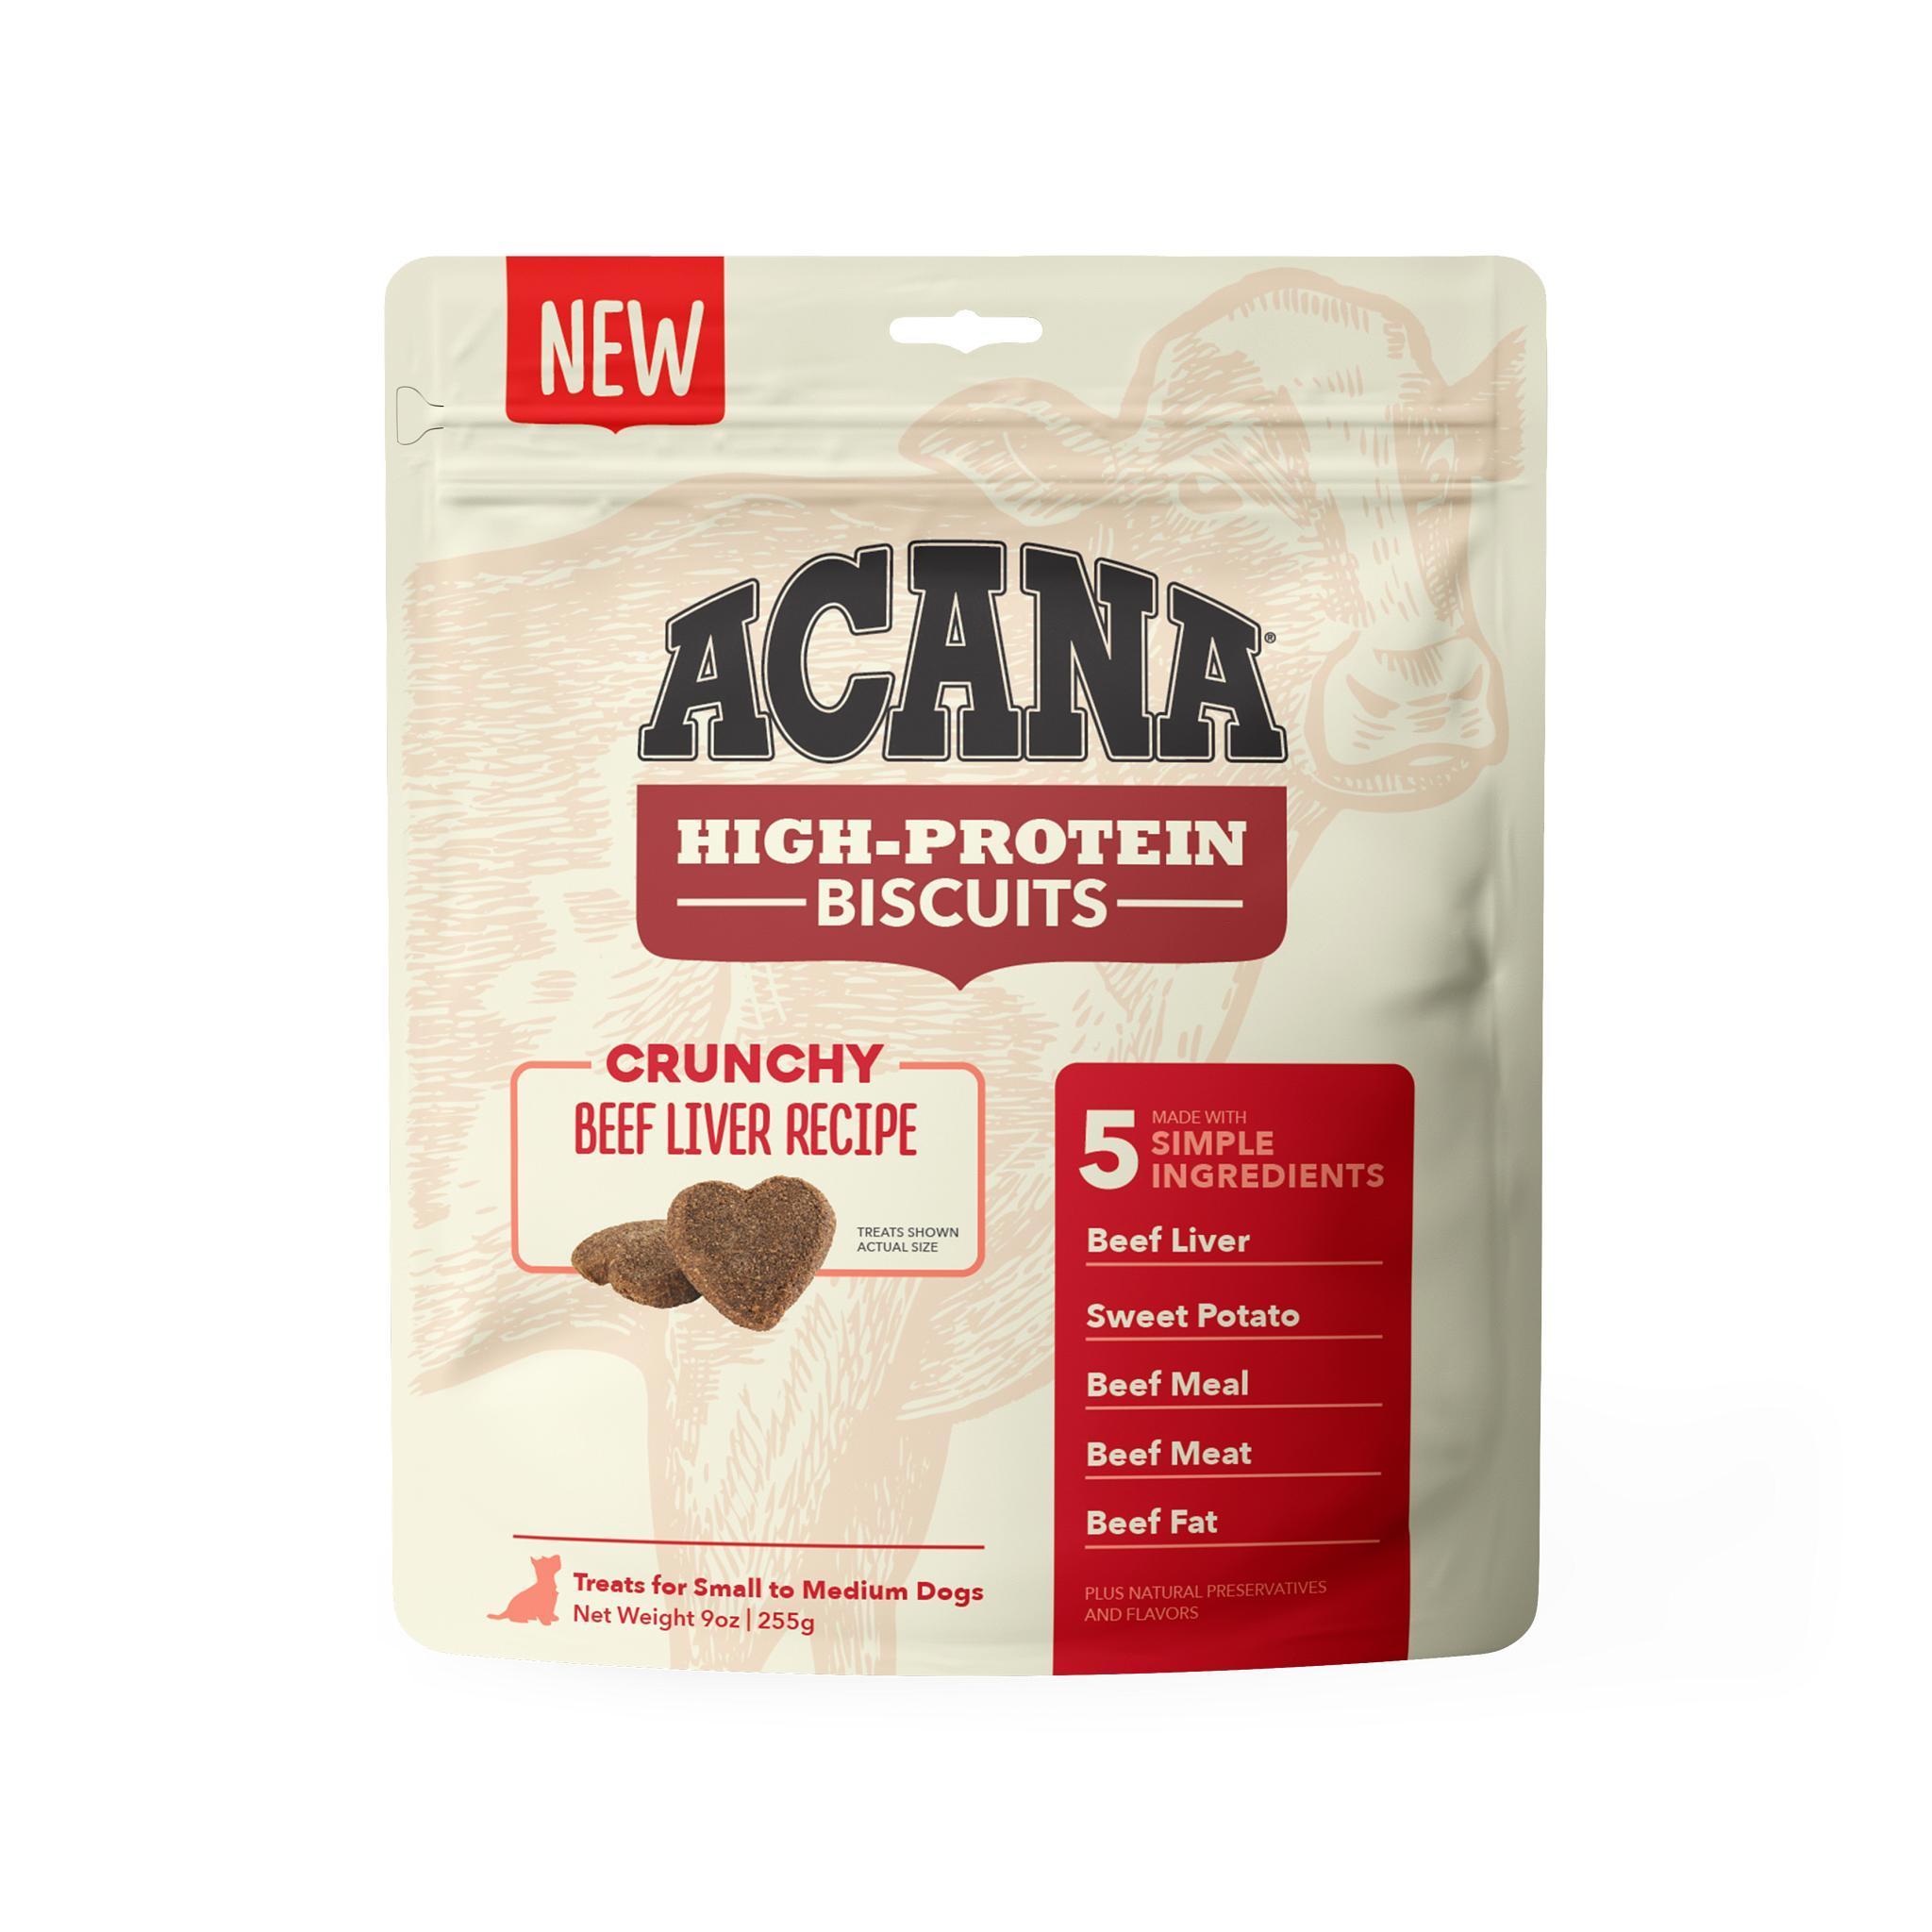 ACANA Crunchy Biscuits Beef Liver Recipe Dog Treats Image